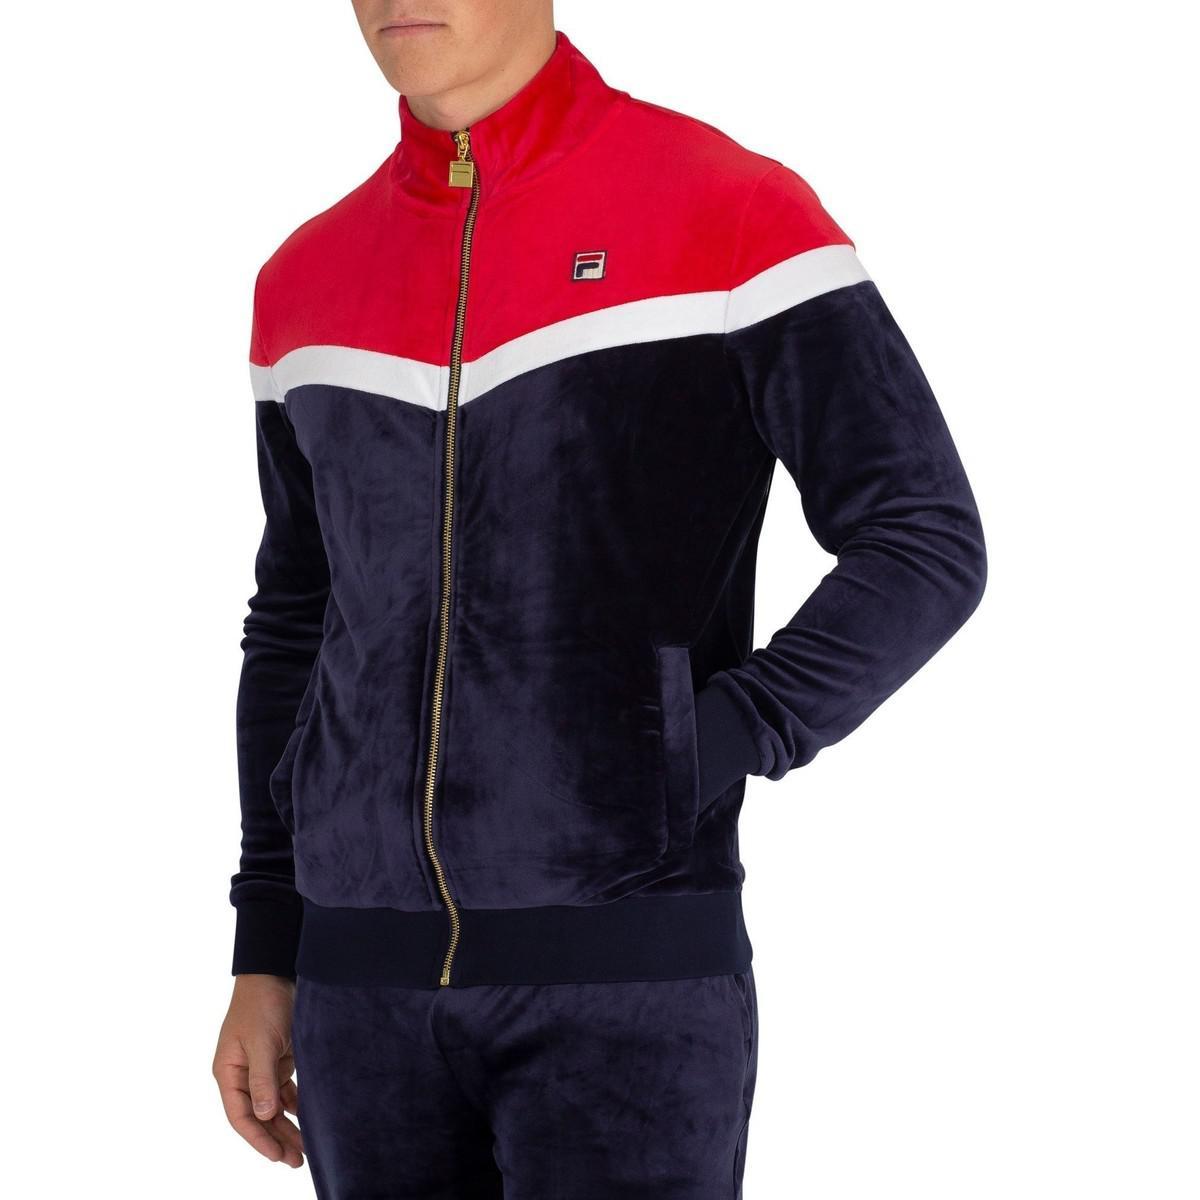 94b758df Fila Men's Harry Vintage Style Track Jacket, Blue Men's Tracksuit ...